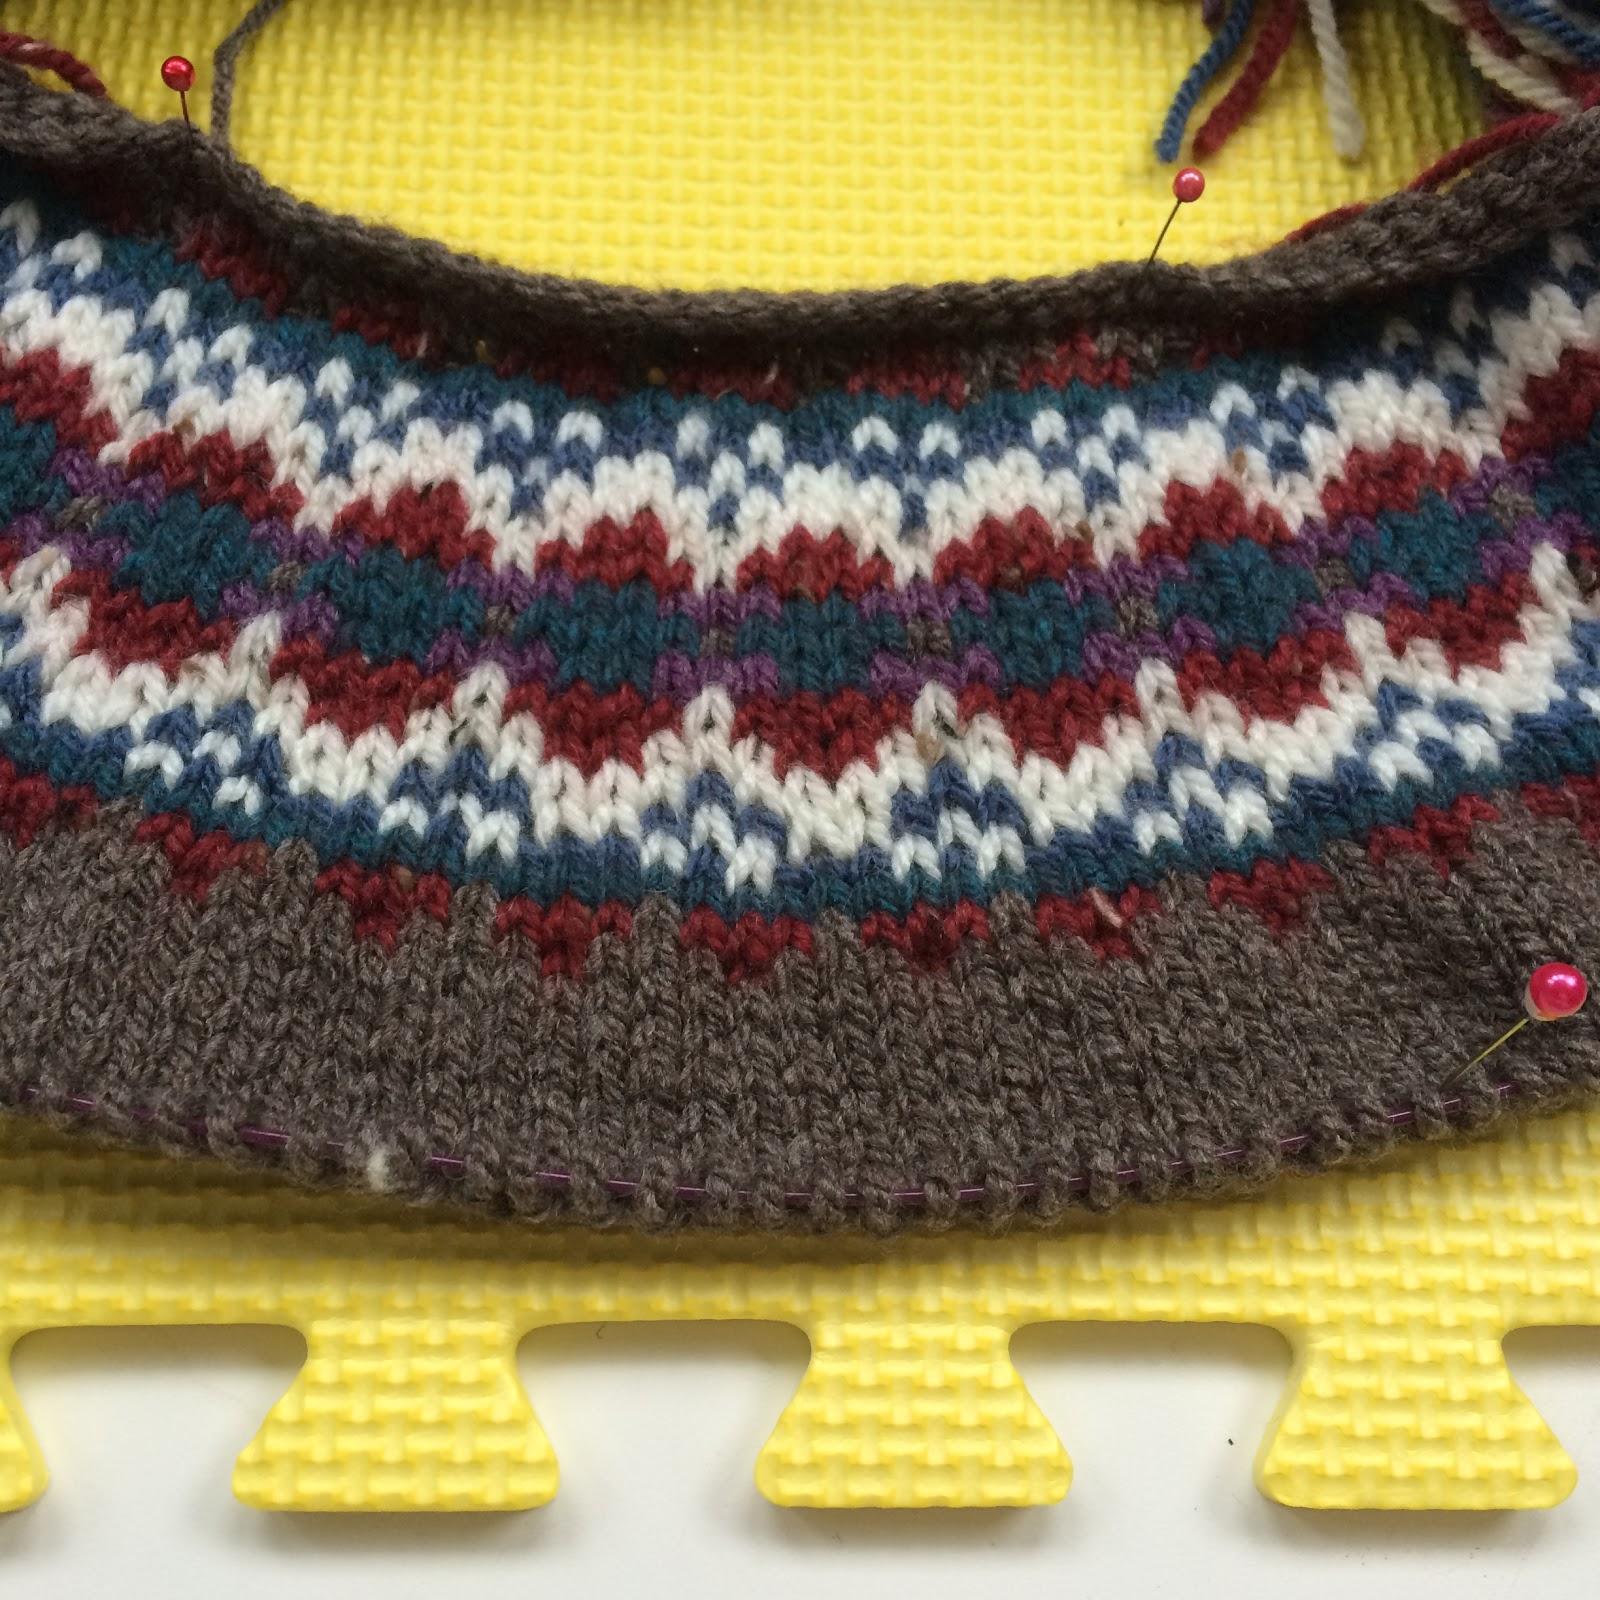 Aldi Knitting Pattern Baby Blanket : GRANNYS WORLD: Knitting - Wednesdays WIP